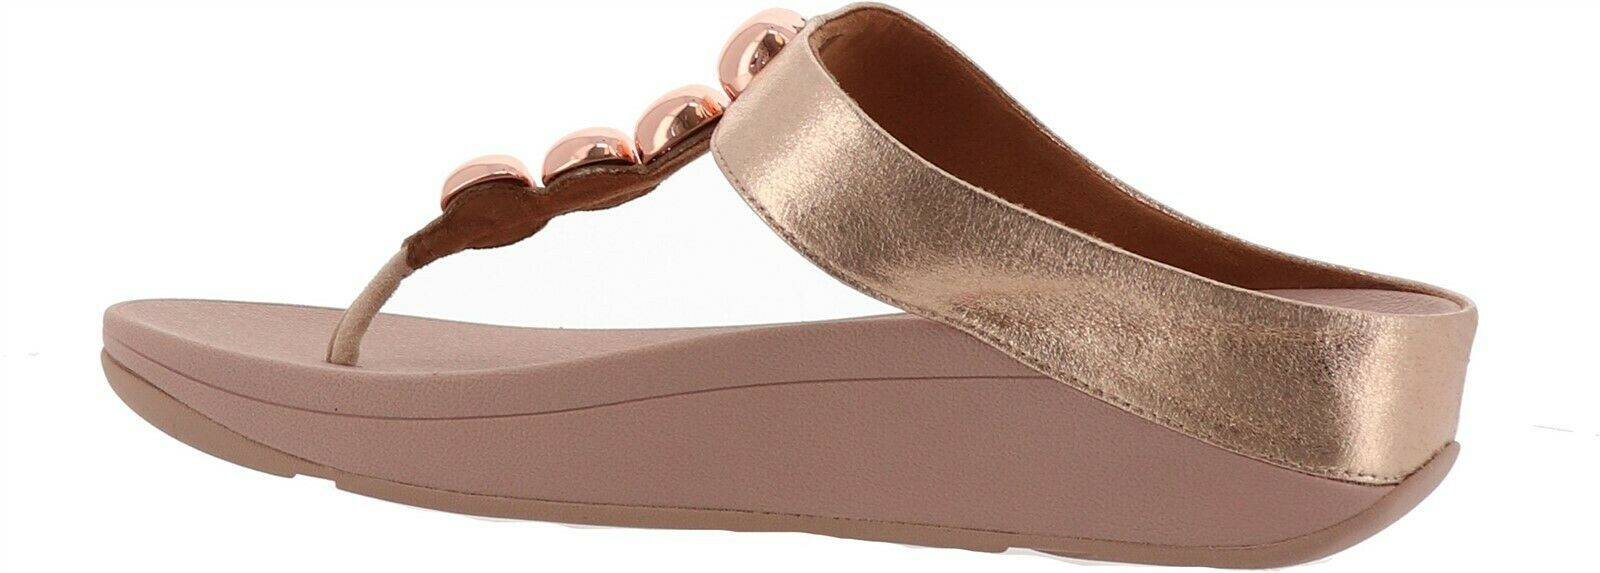 FitFlop Francheska Glitzy Toe Post Sandal Rose Gold 8 NEW 699-161 - $91.06